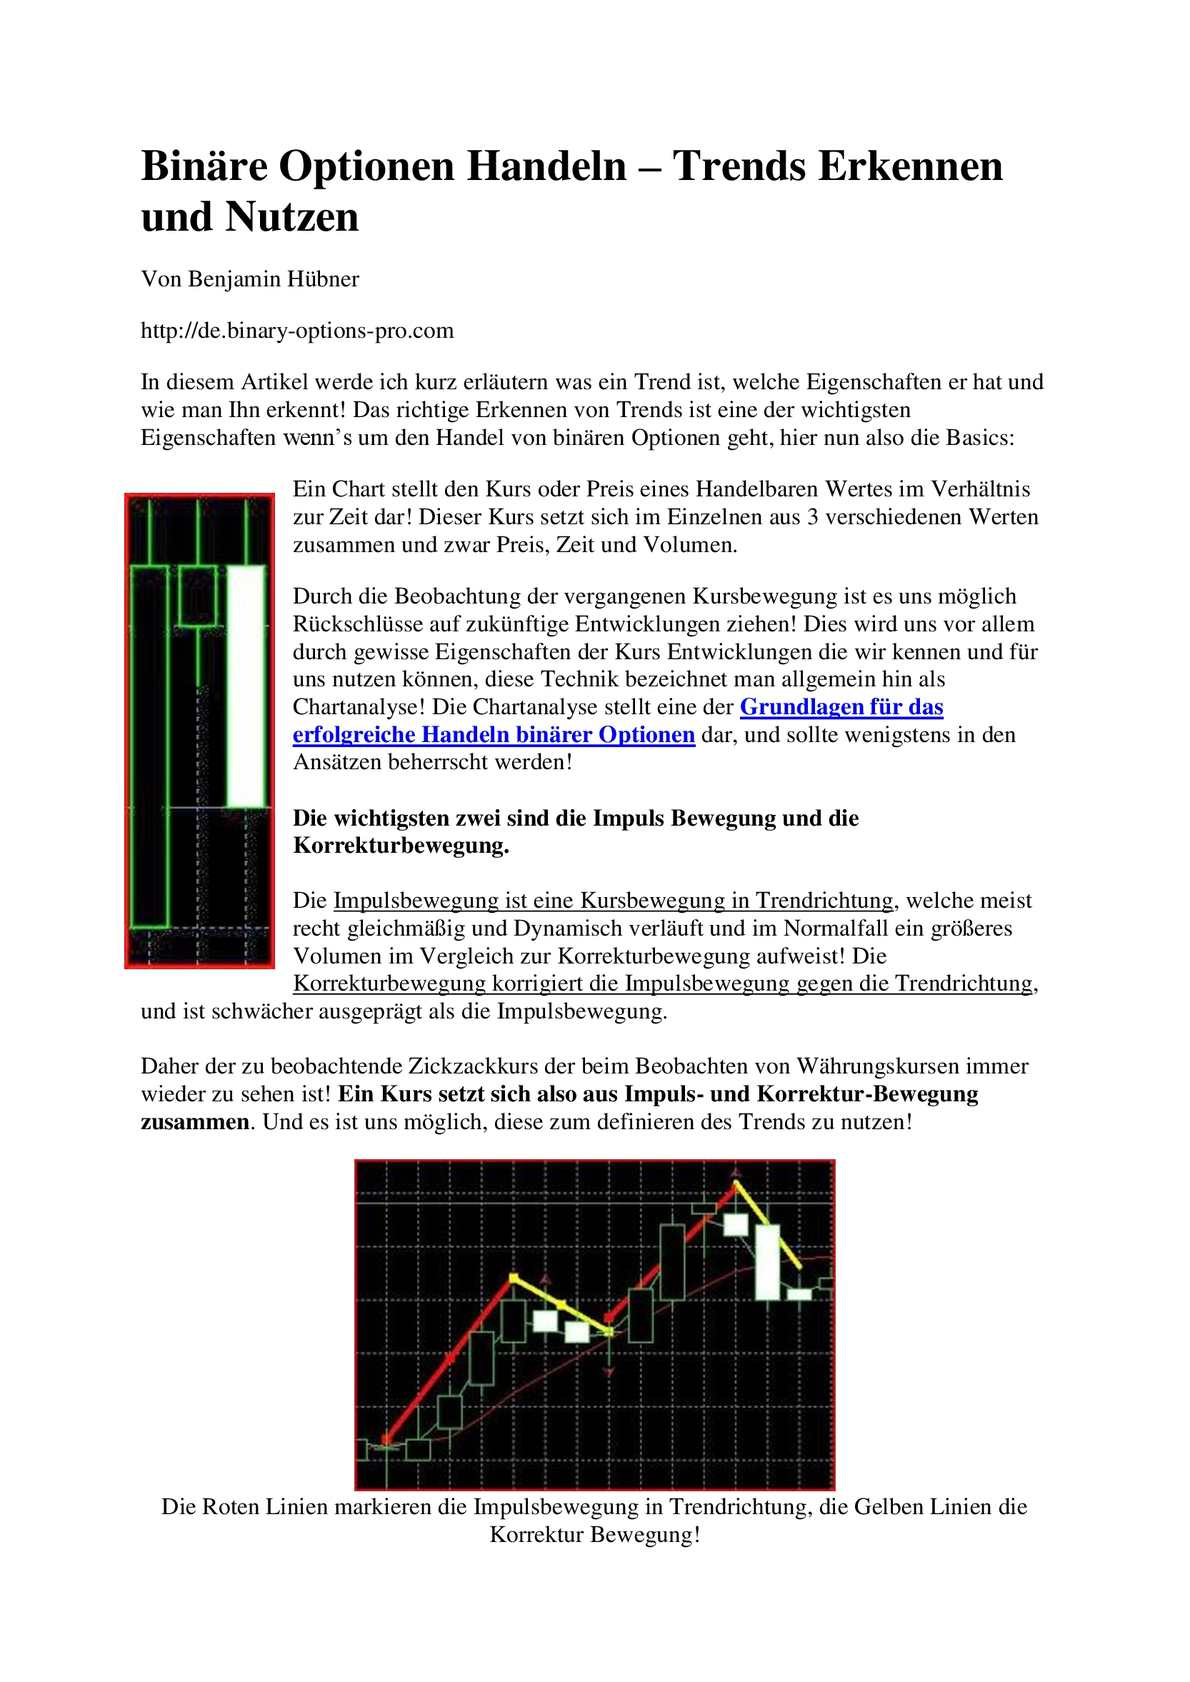 grundlagen des binären handels money cheats red dead redemption 2 online